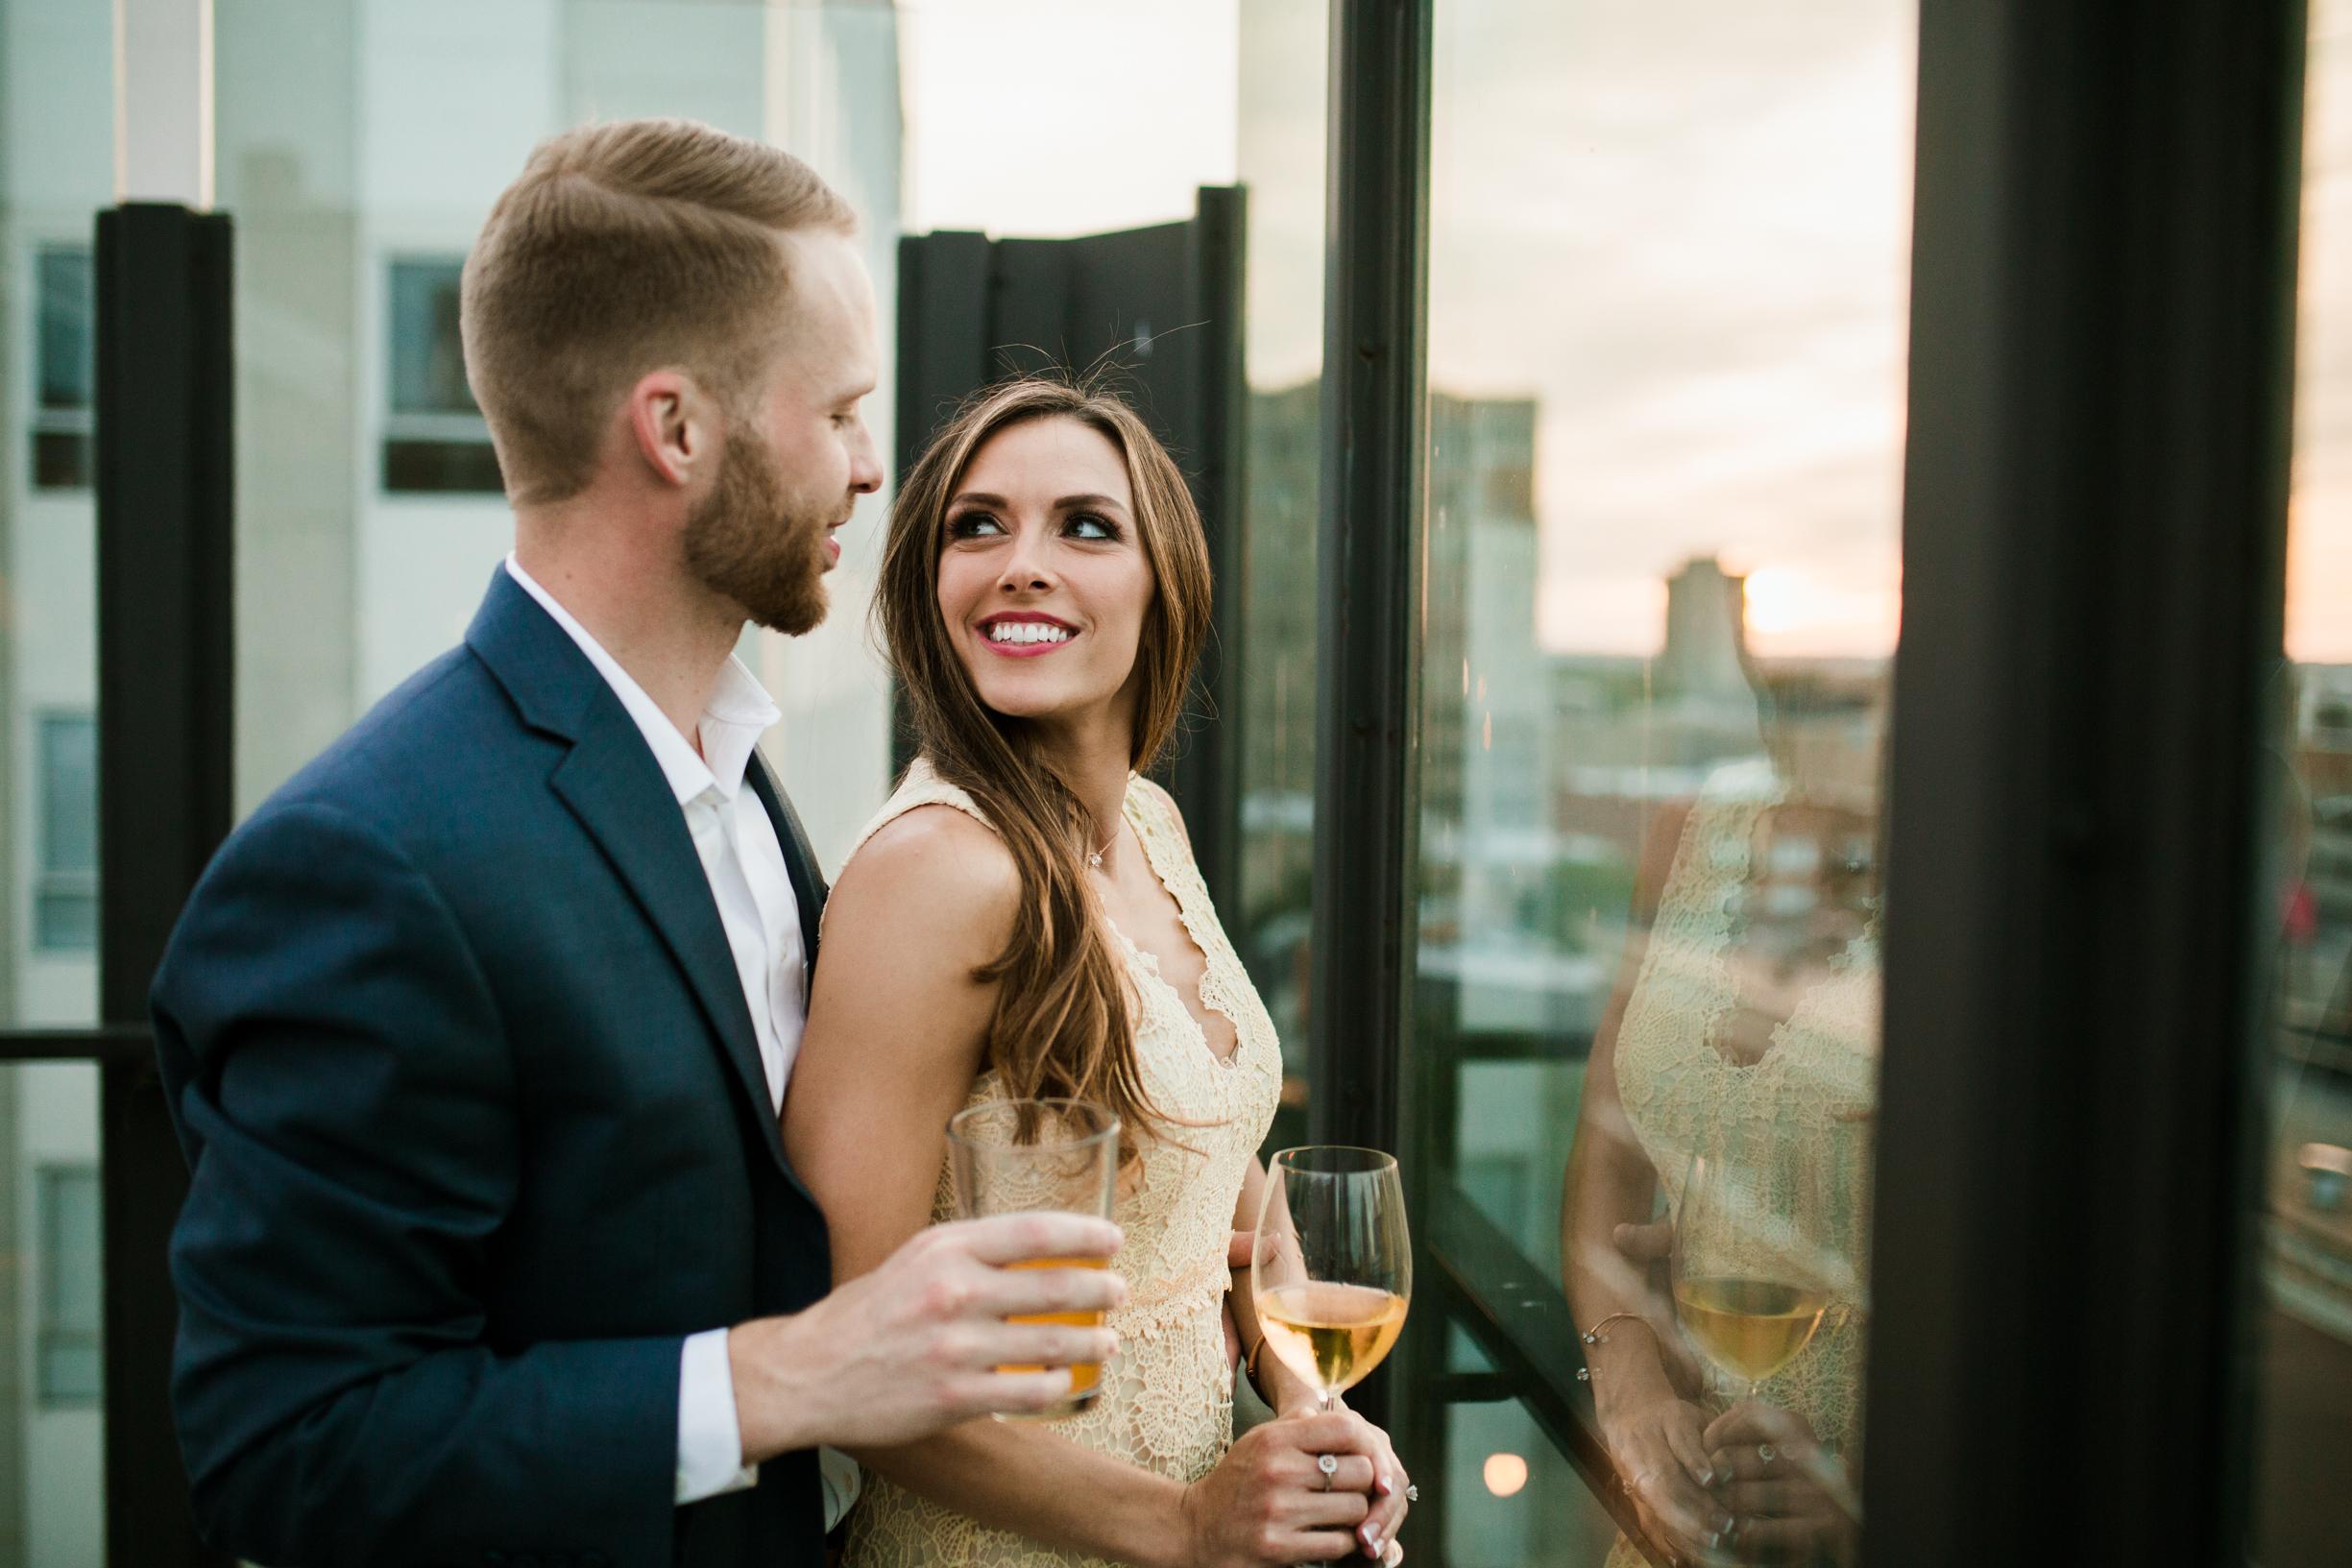 Victoria & Chad Engagement 2018 Crystal Ludwick Photo Louisville Kentucky Wedding Photographer WEBSITE (13 of 48).jpg